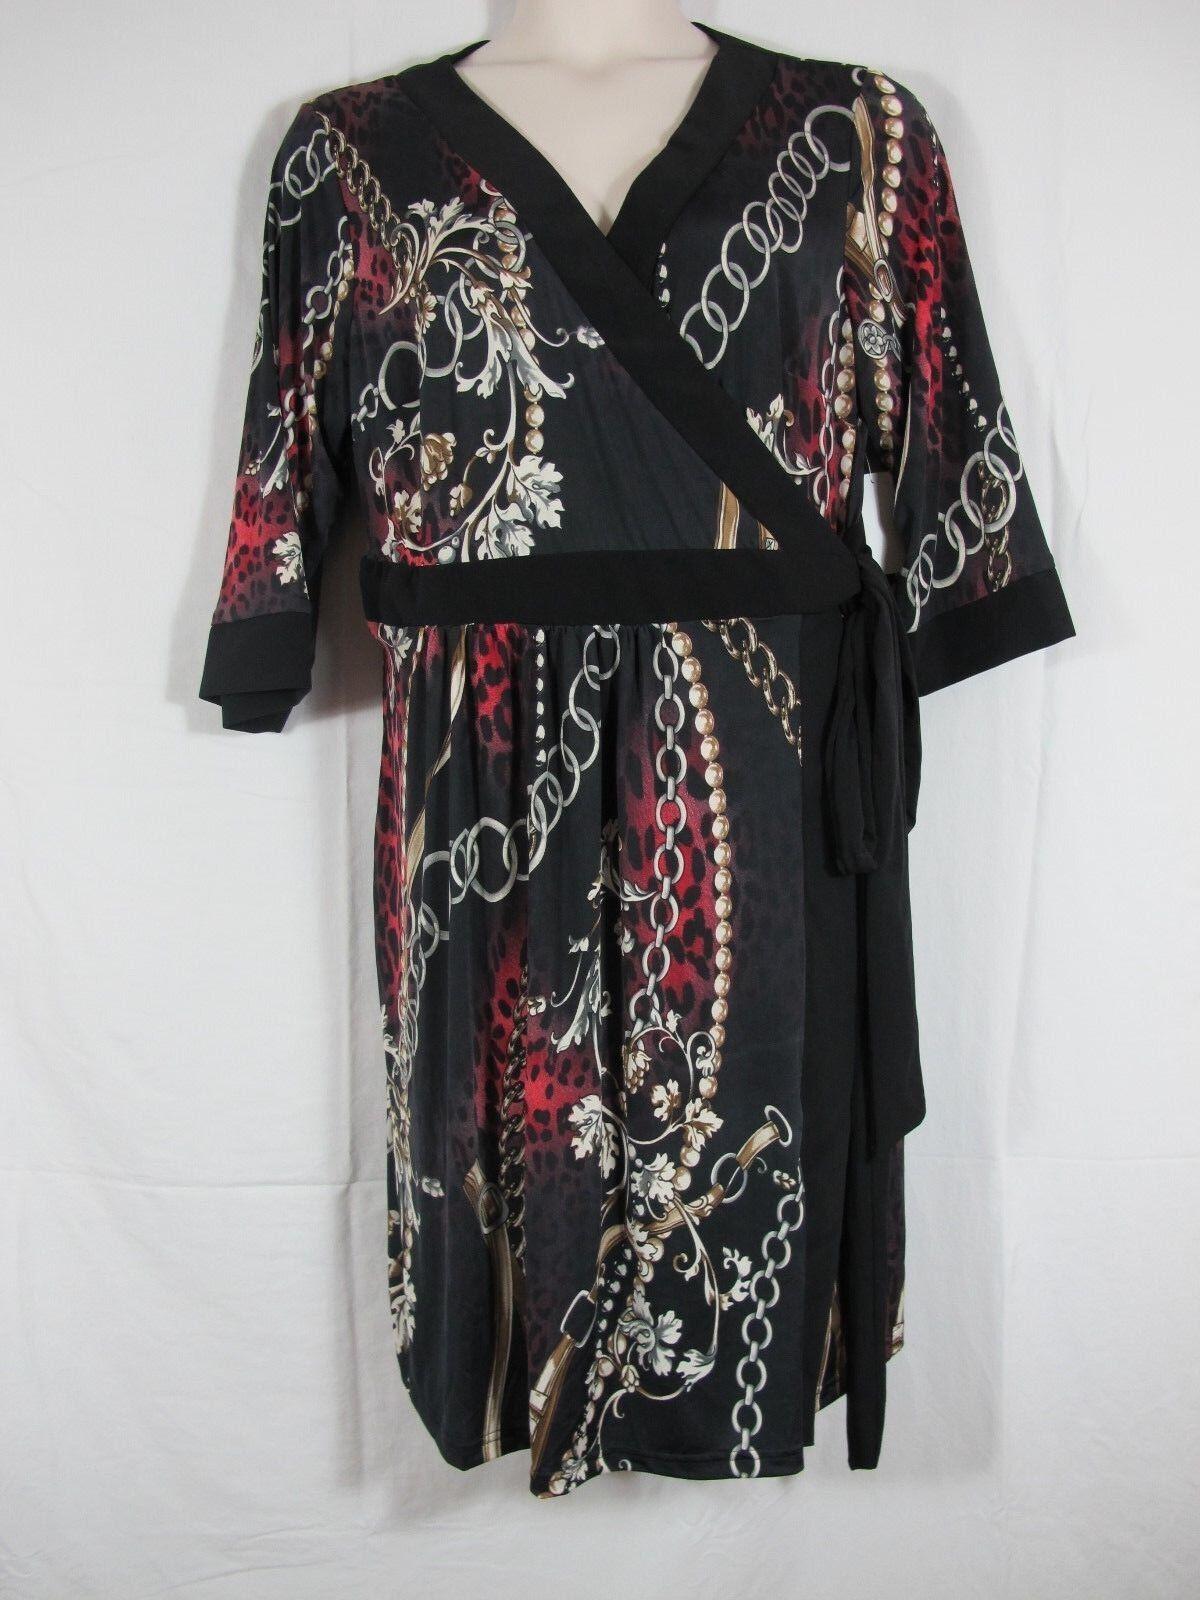 Melissa Masse Classic Wrap Dress schwarz Multi Farbe MARSALA FIGARO PEARL Plus 3X